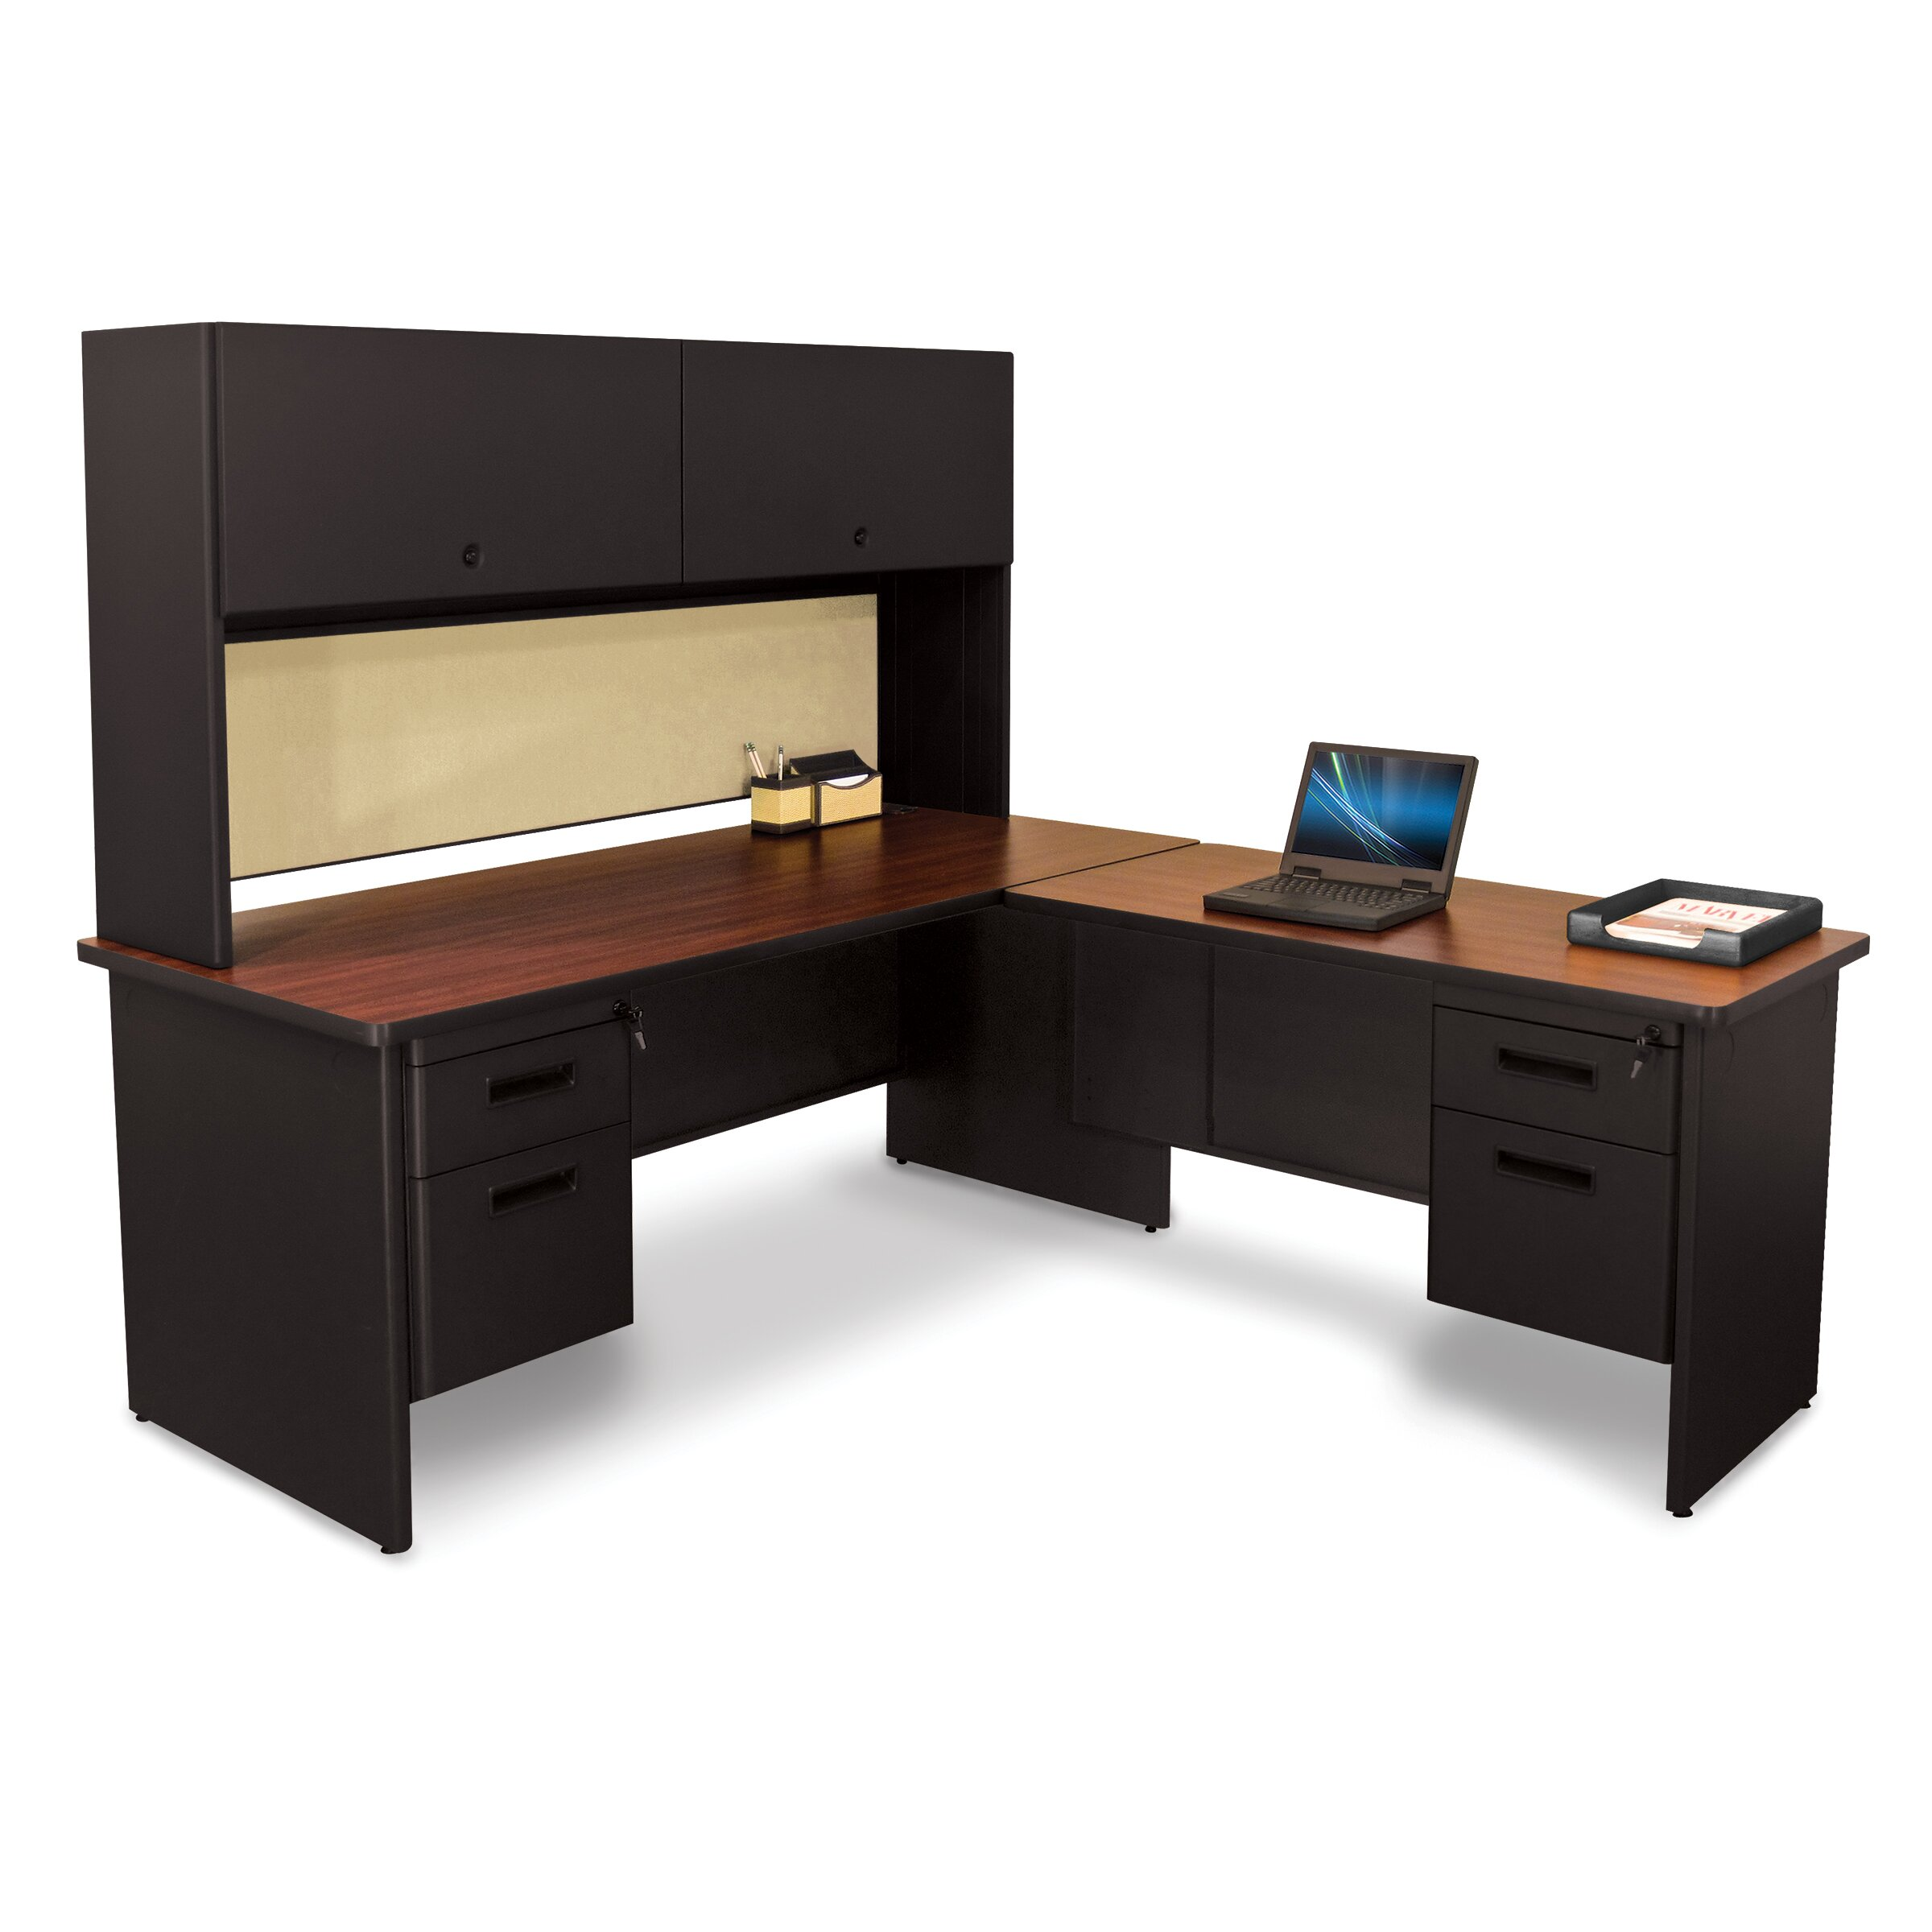 Marvel Office Furniture Pronto L-Shape Executive Desk With